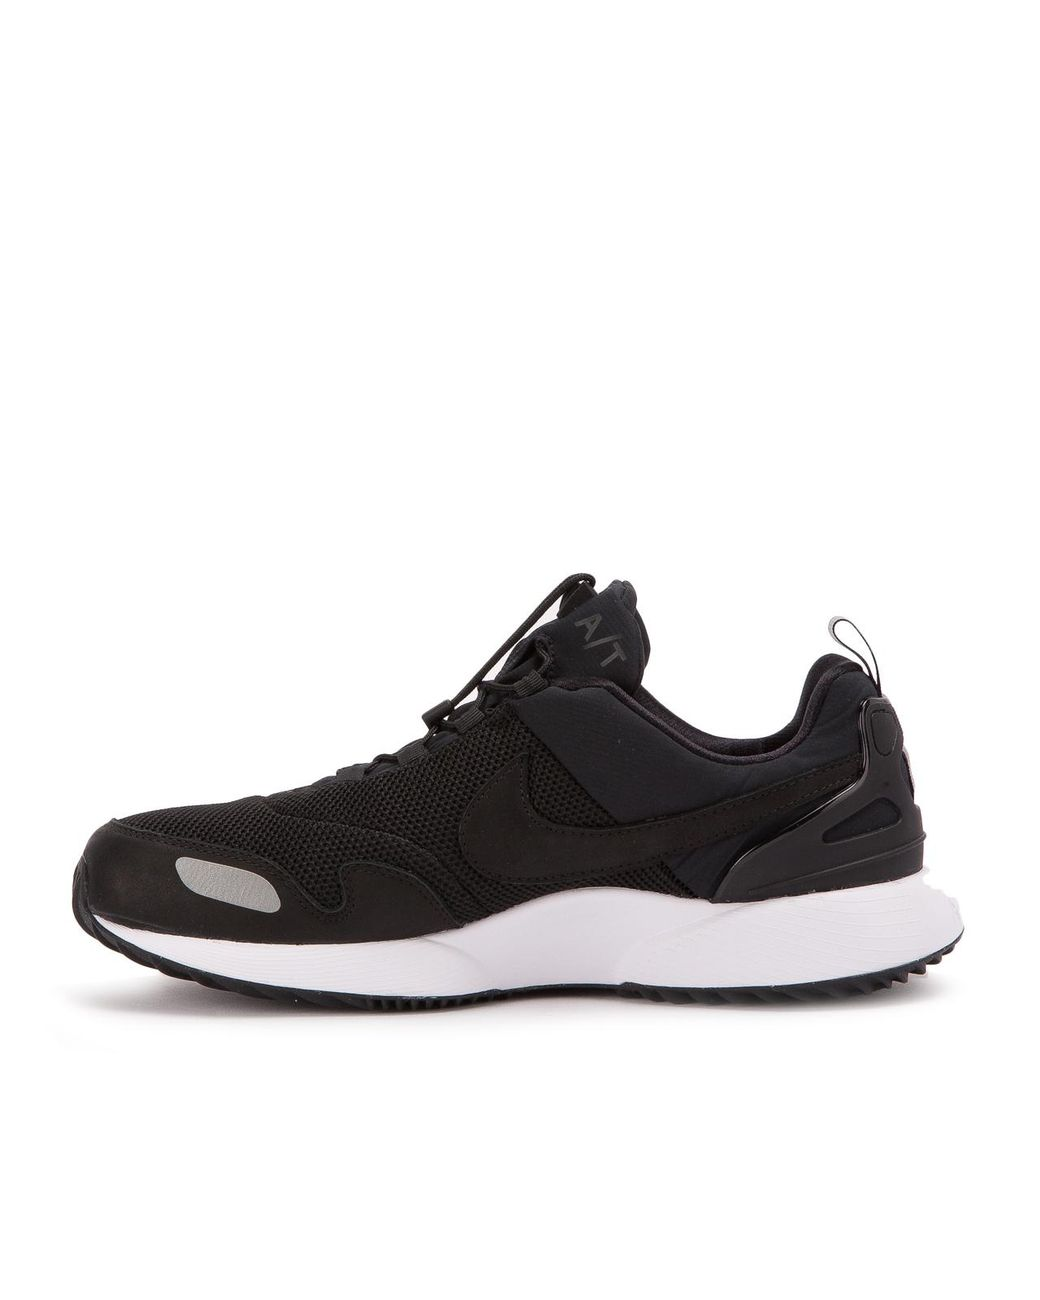 the latest 254fd 7fb95 Nike Nike Air Pegasus A t Prm in Black for Men - Lyst